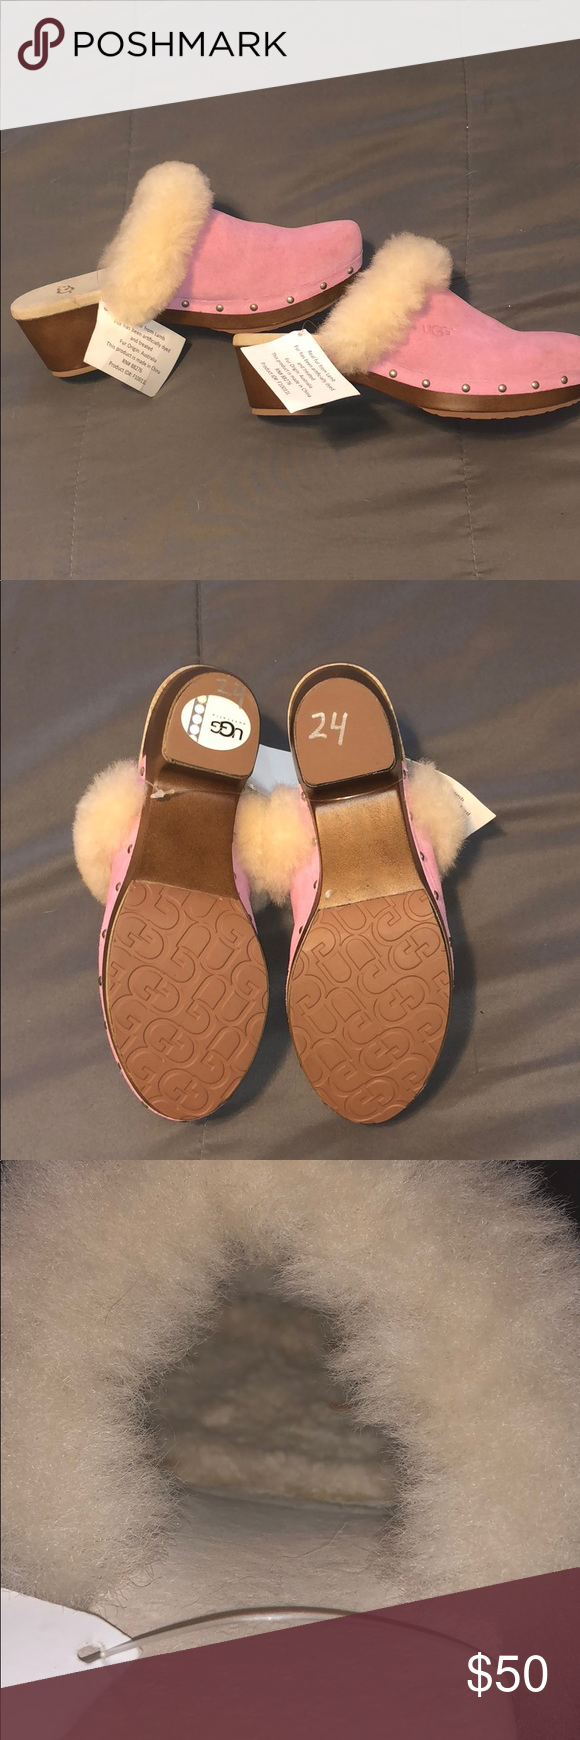 2b4b2a1fbb Kids Pink clogs Uggs with fur